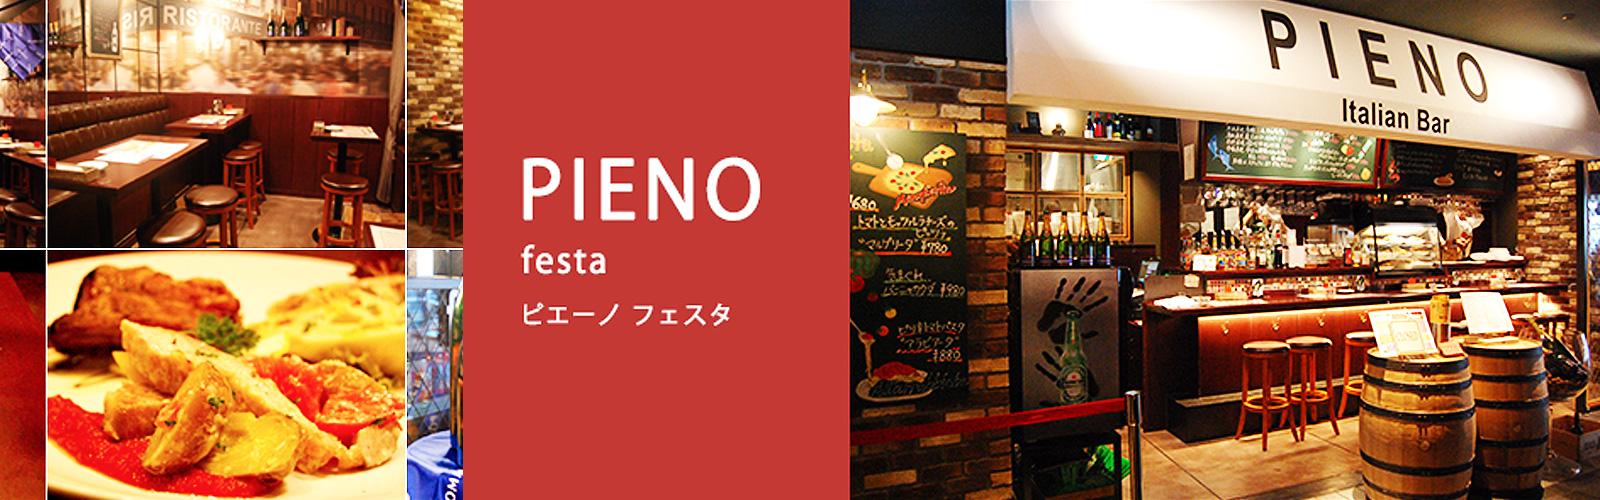 Italian Bar PIENO festa ピエーノ フェスタ(大阪・梅田)